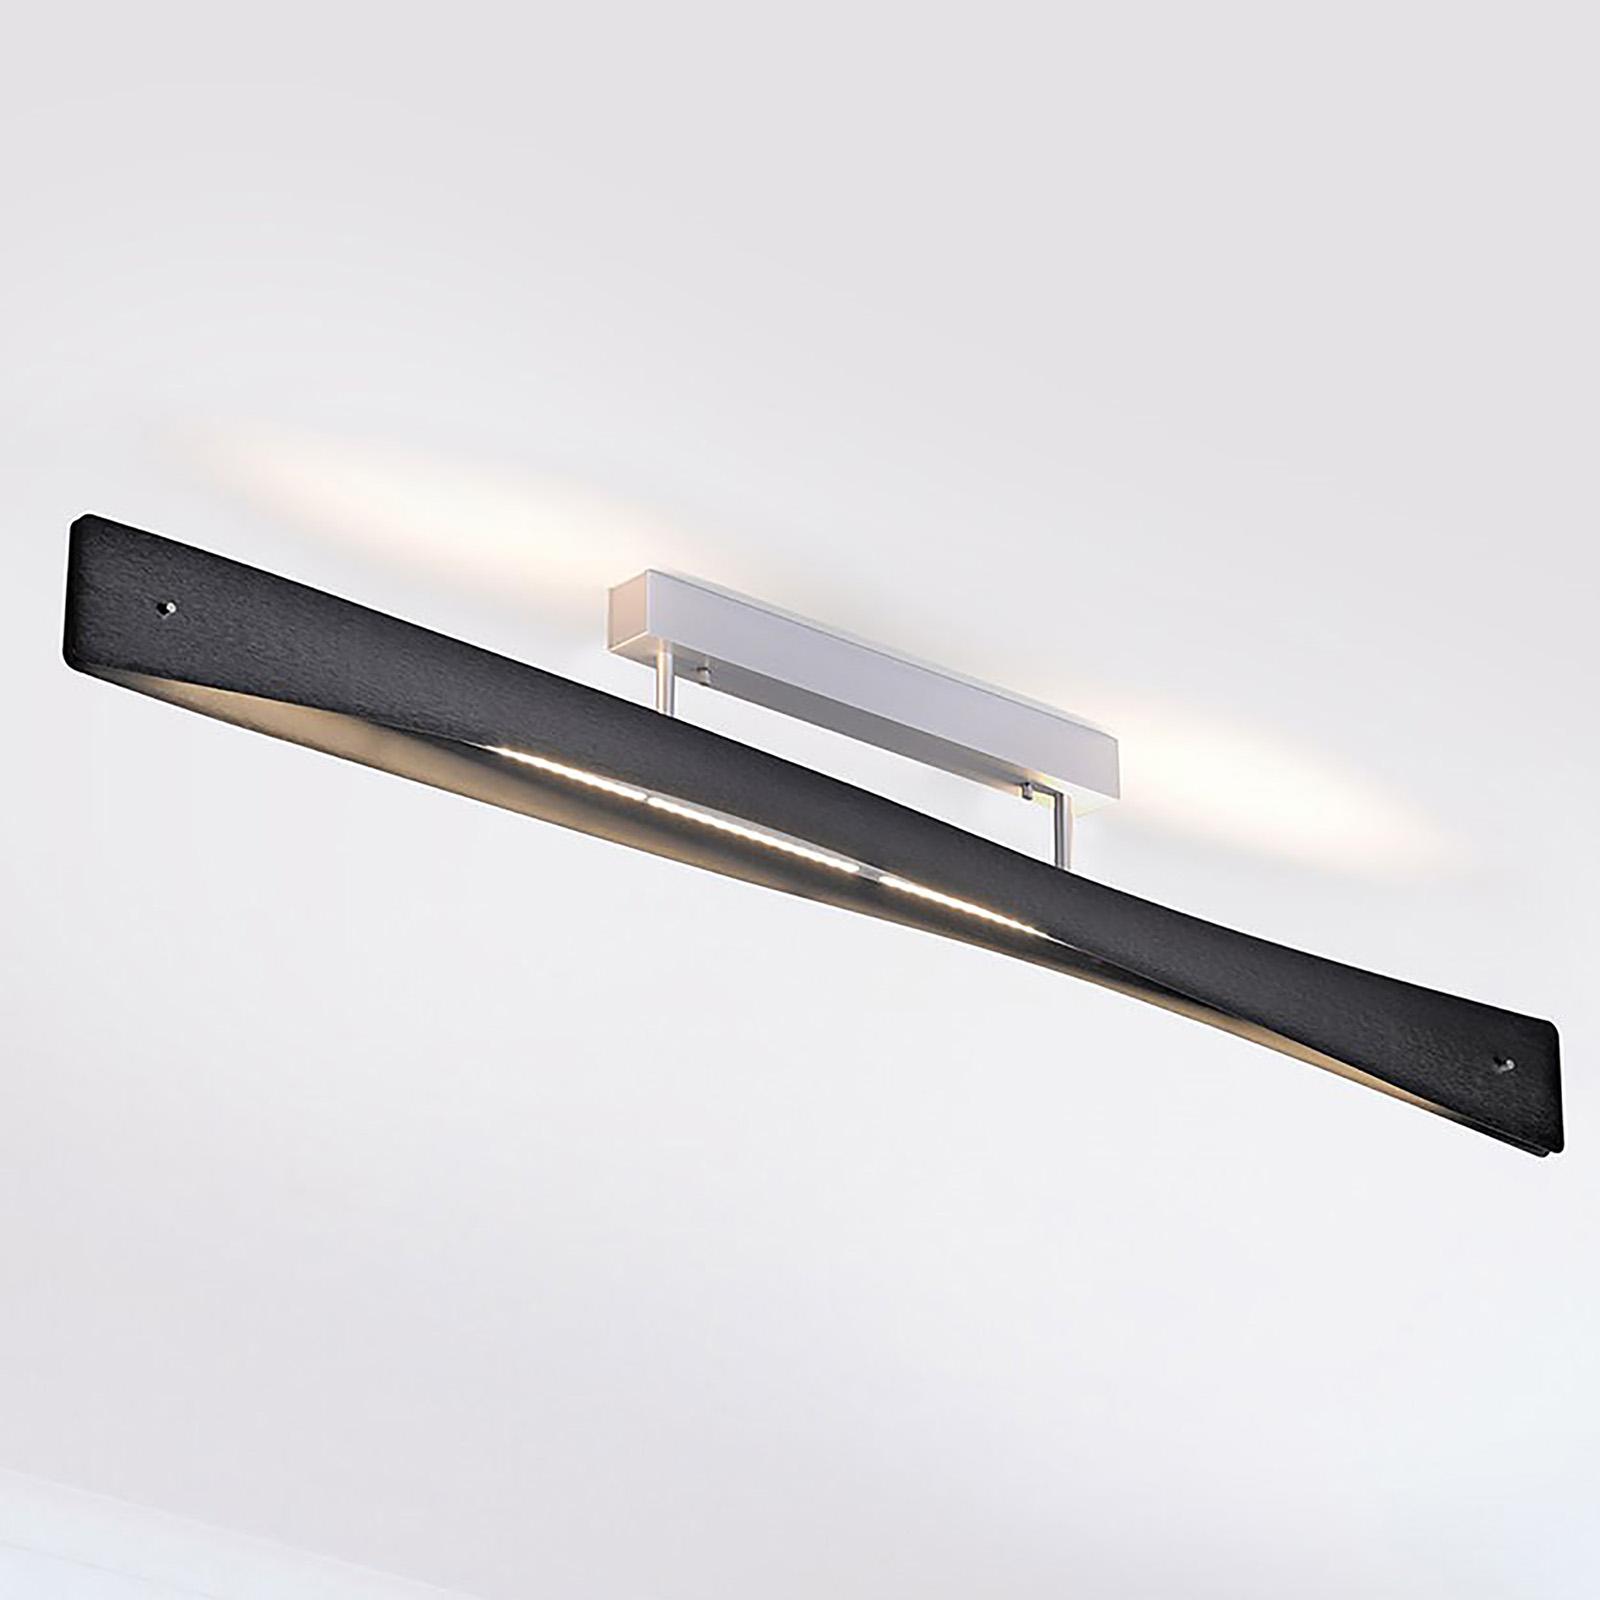 Lucande Lian LED-Deckenlampe, schwarz, alu